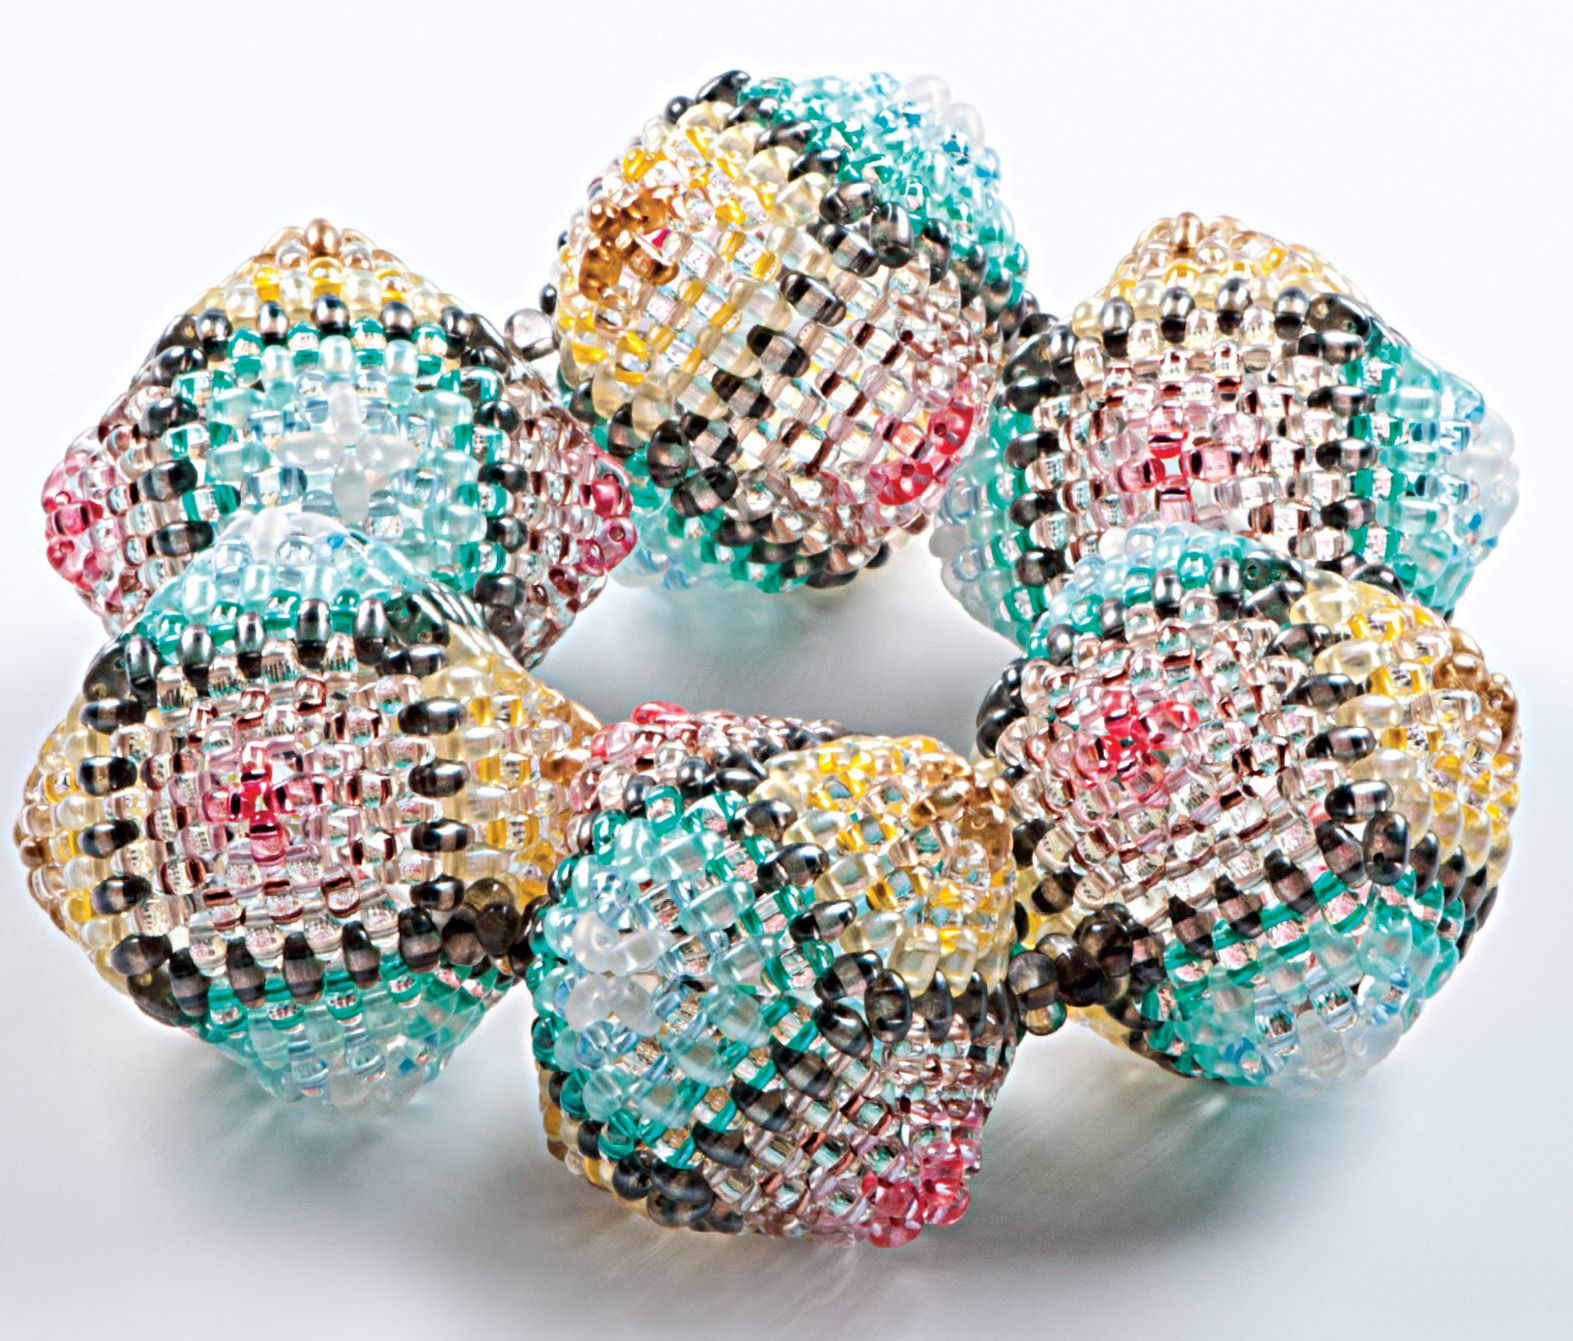 Sewn Seed Bracelet Twin Beads Seed Beads Jewelry Making Beaded ...